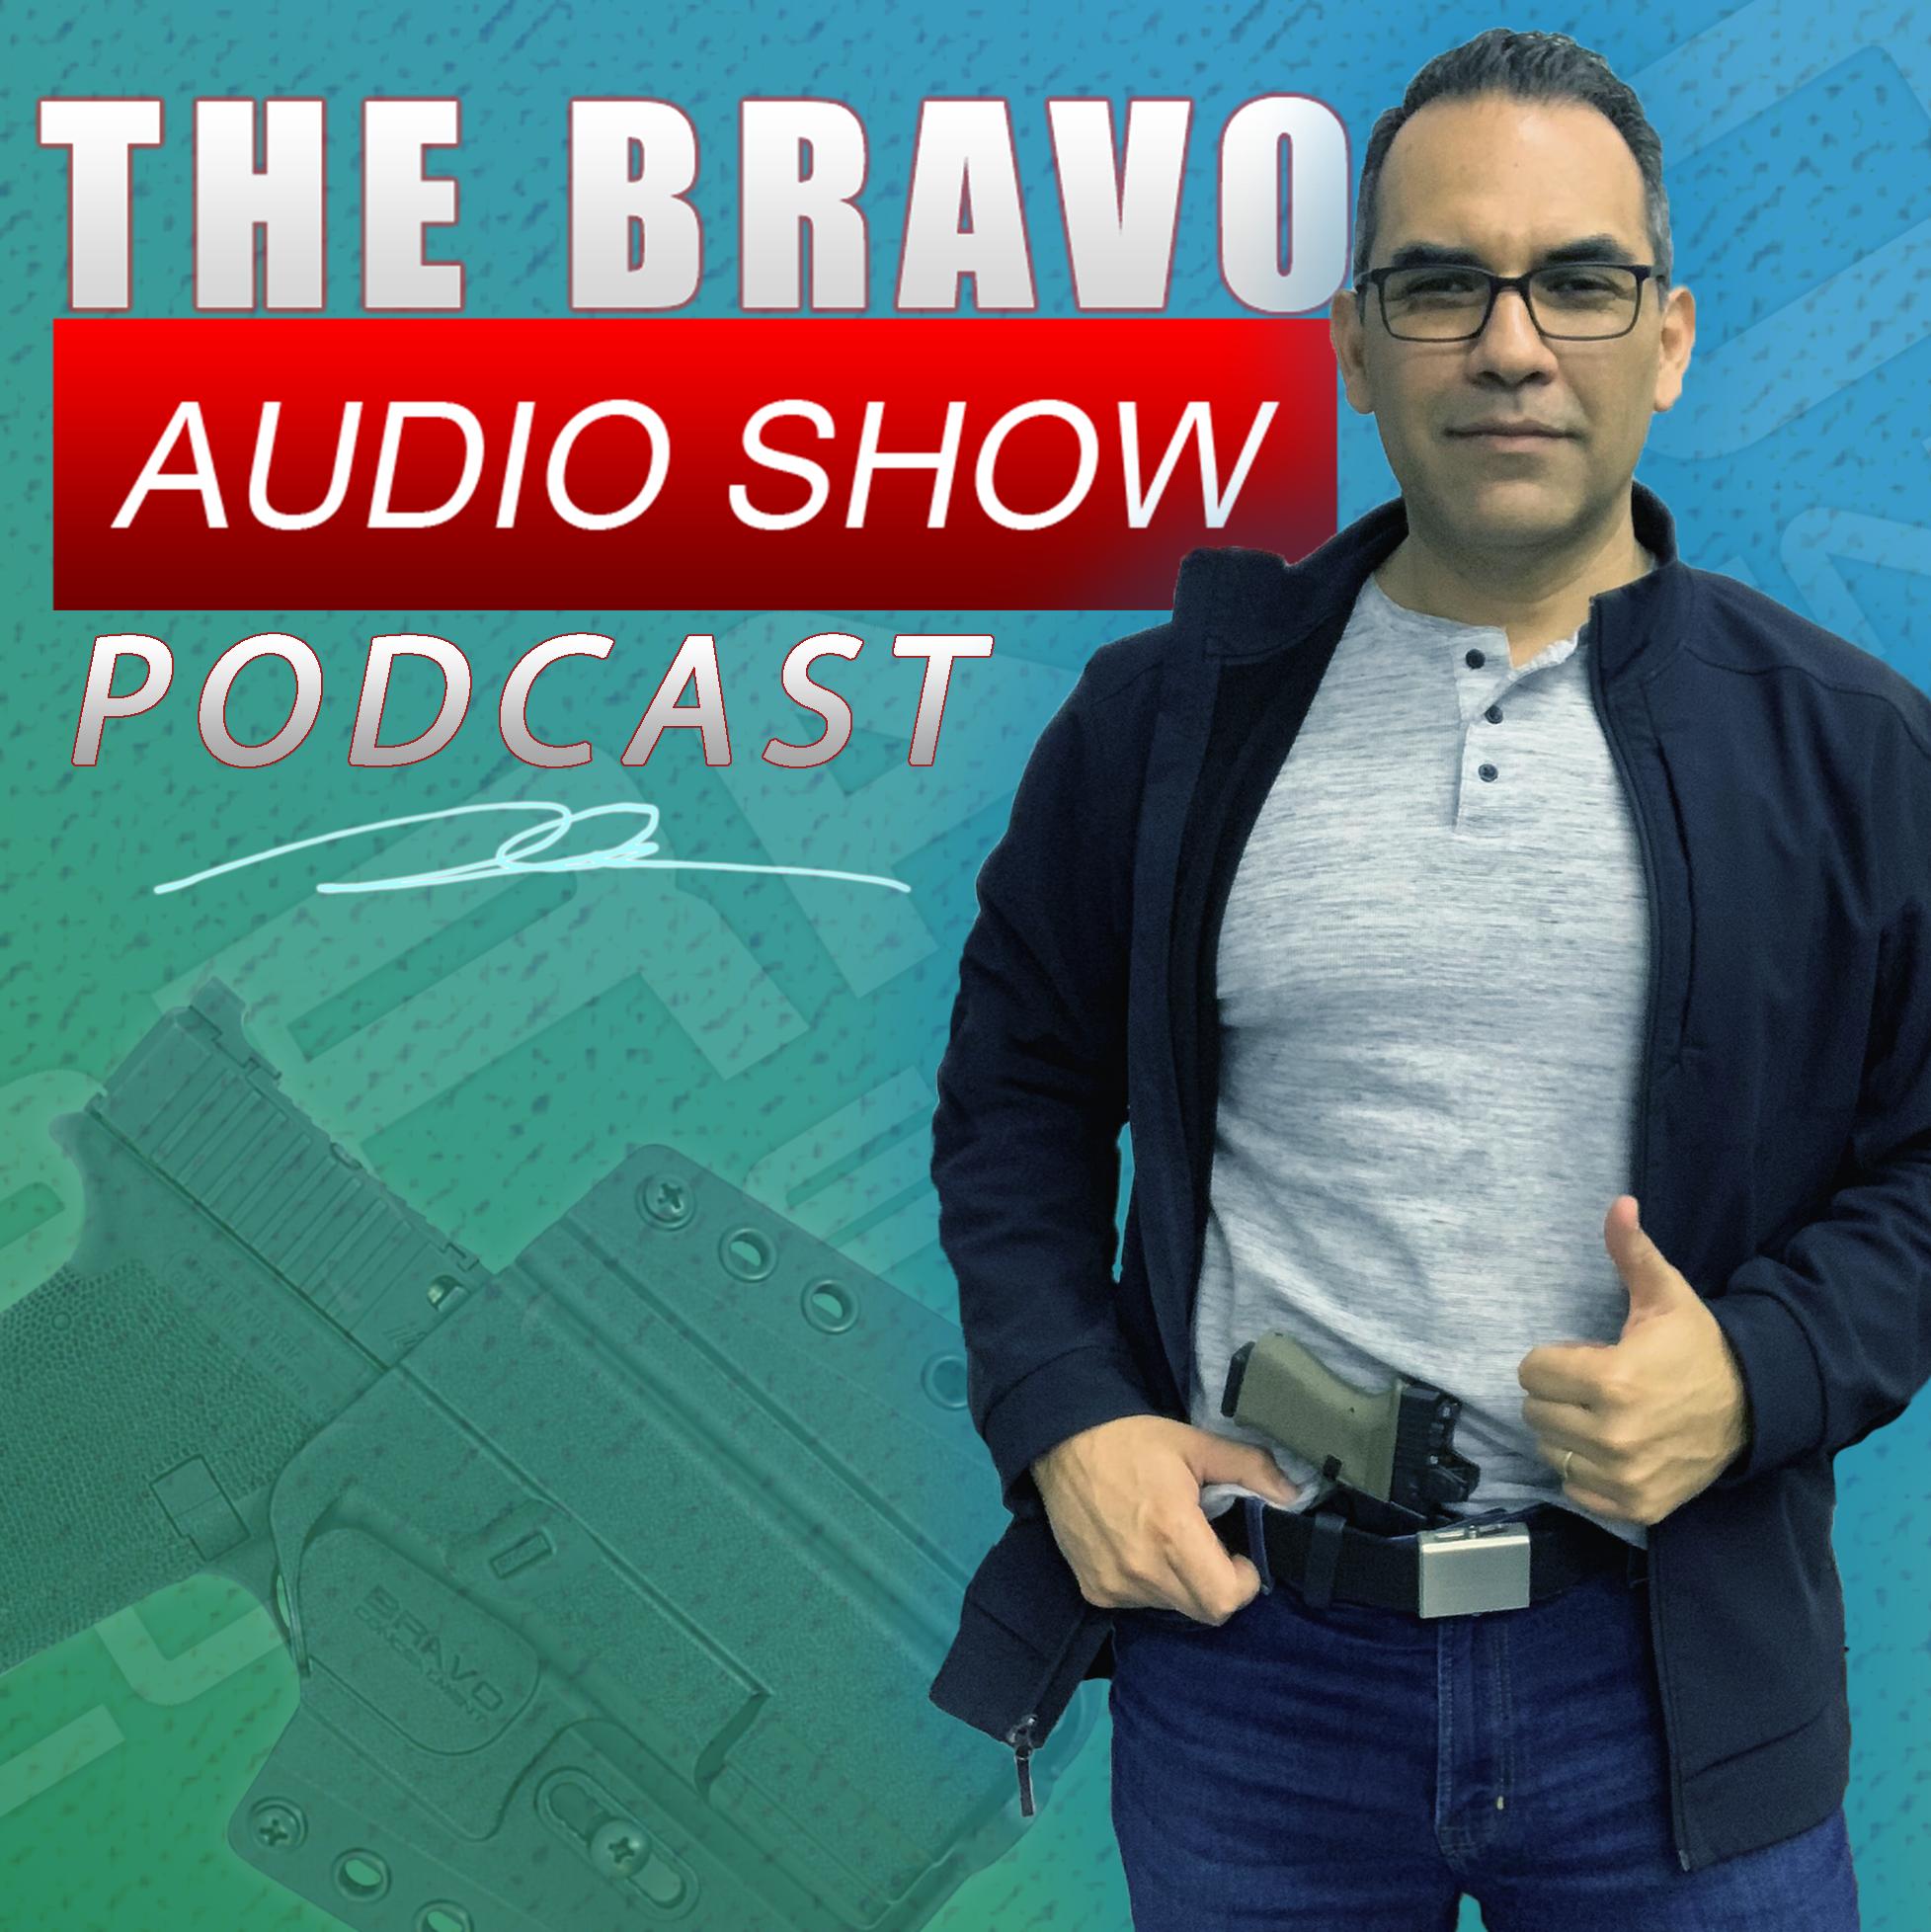 The Bravo Audio Show show art